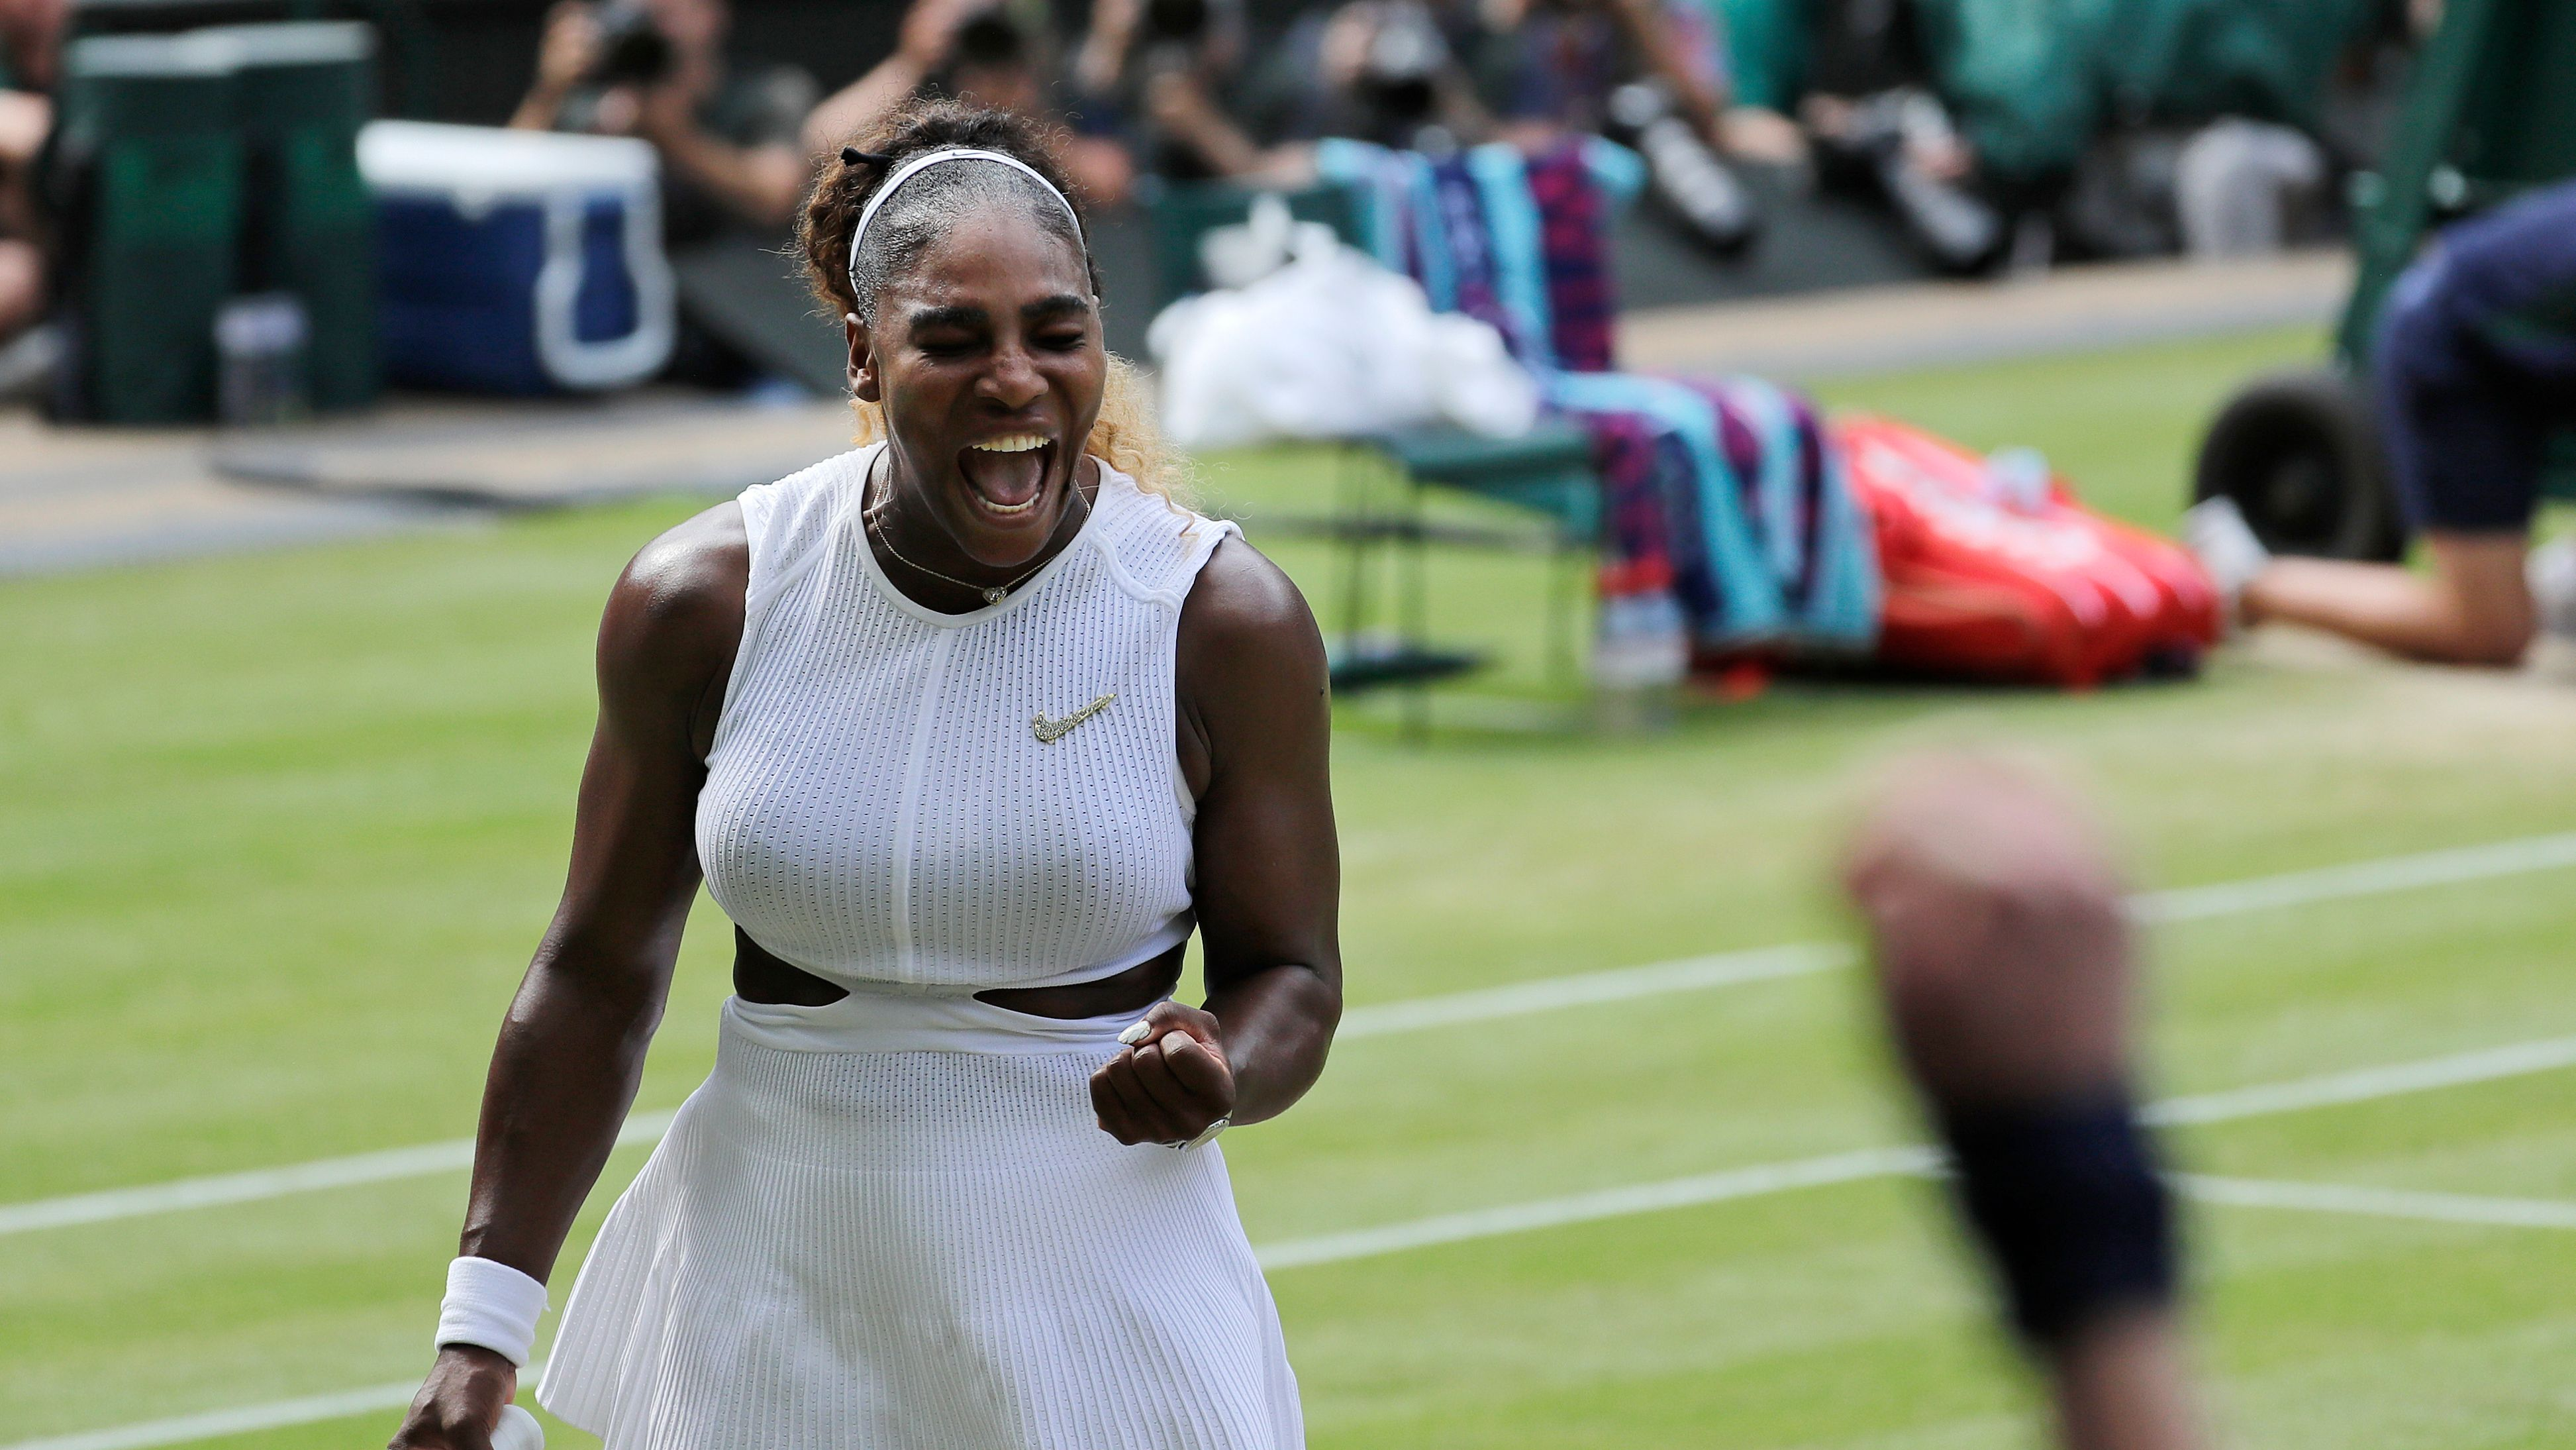 Williams Halep Wimbledon Final